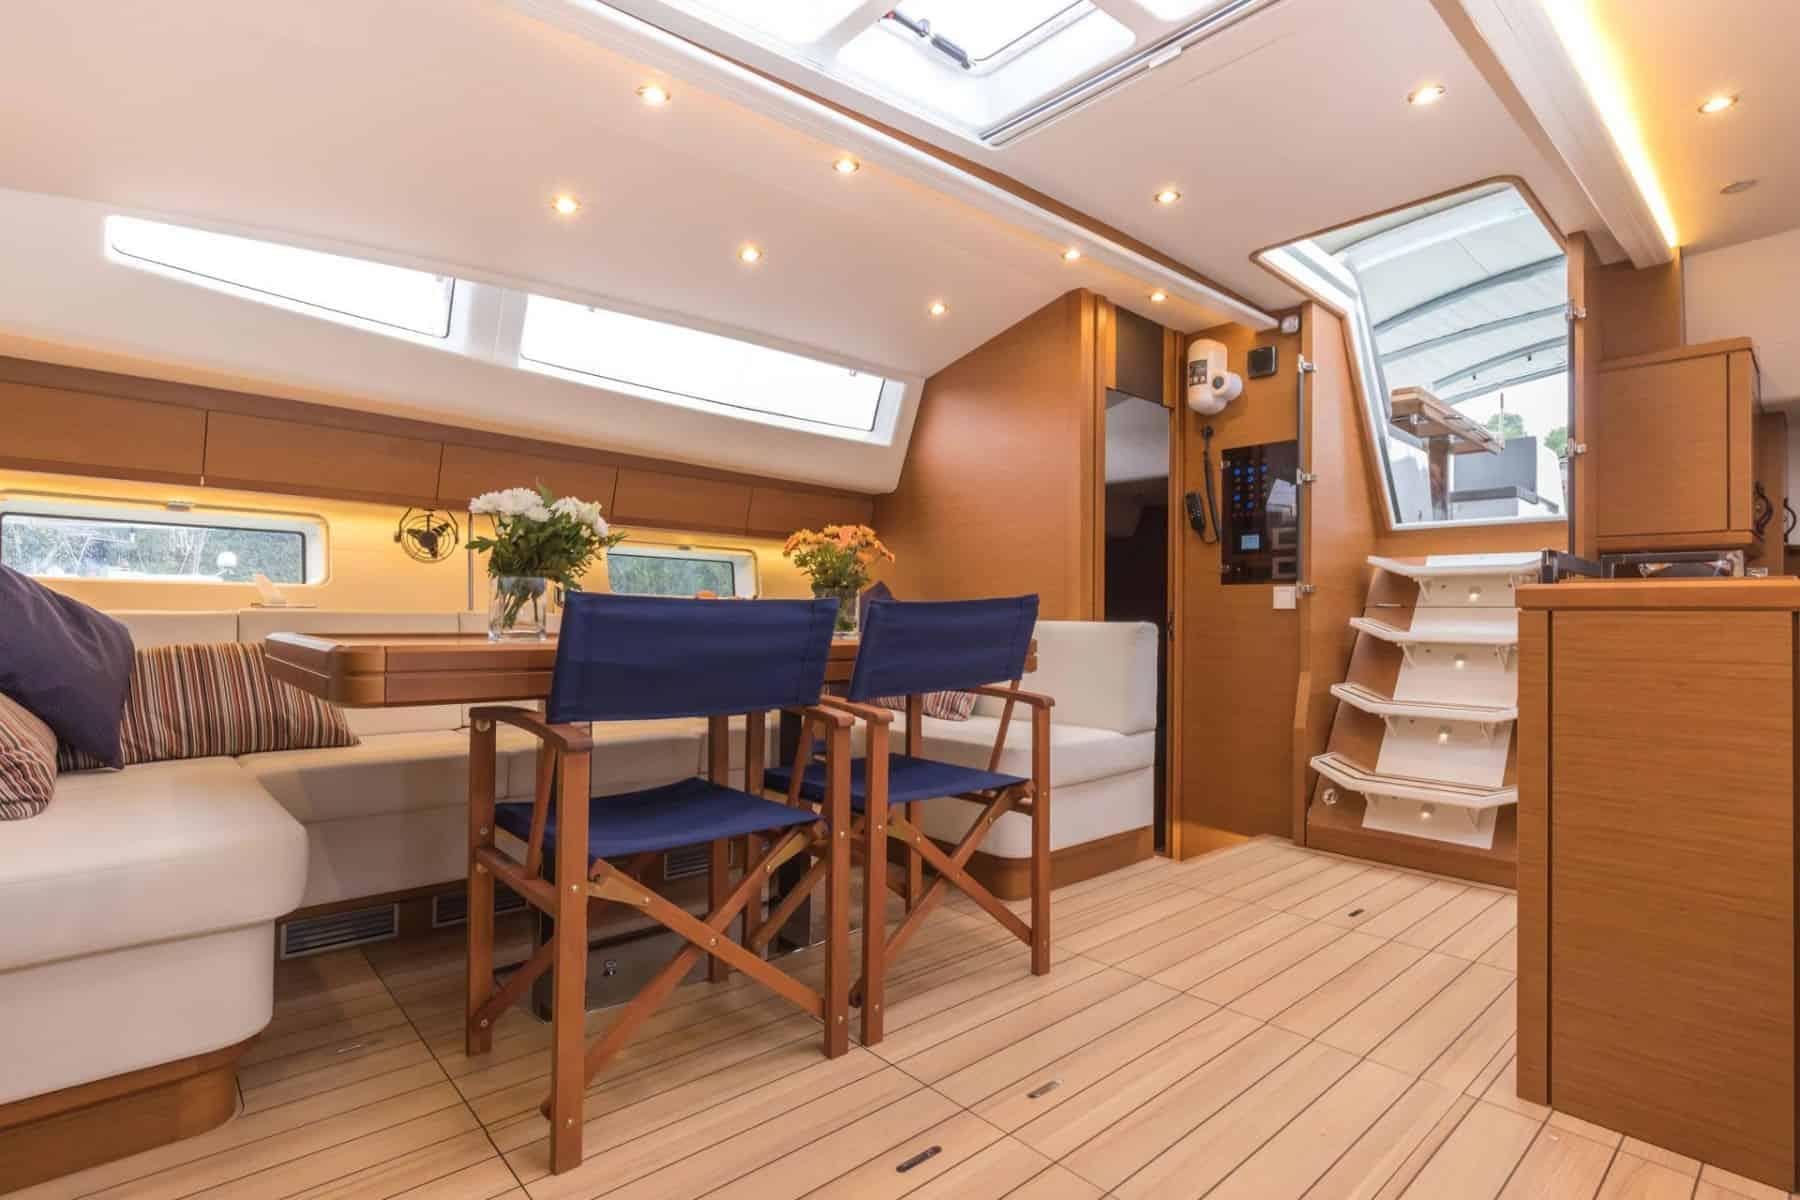 Jeanneau-64-interior-saloon-1-charter-ownership-yacht